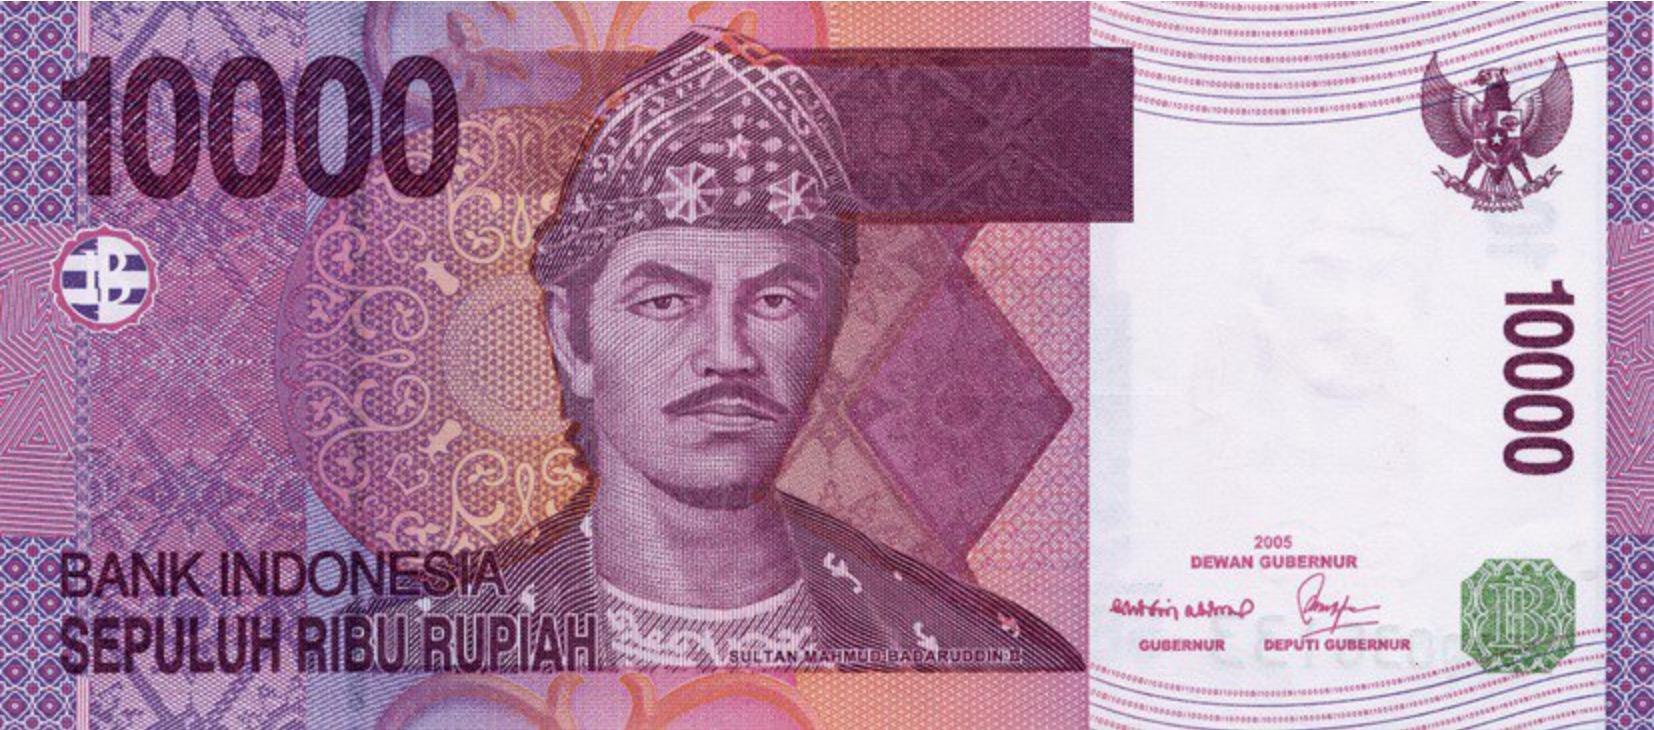 10000 Indonesian Rupiah banknote (Sultan Mahmud Badaruddin II violet)